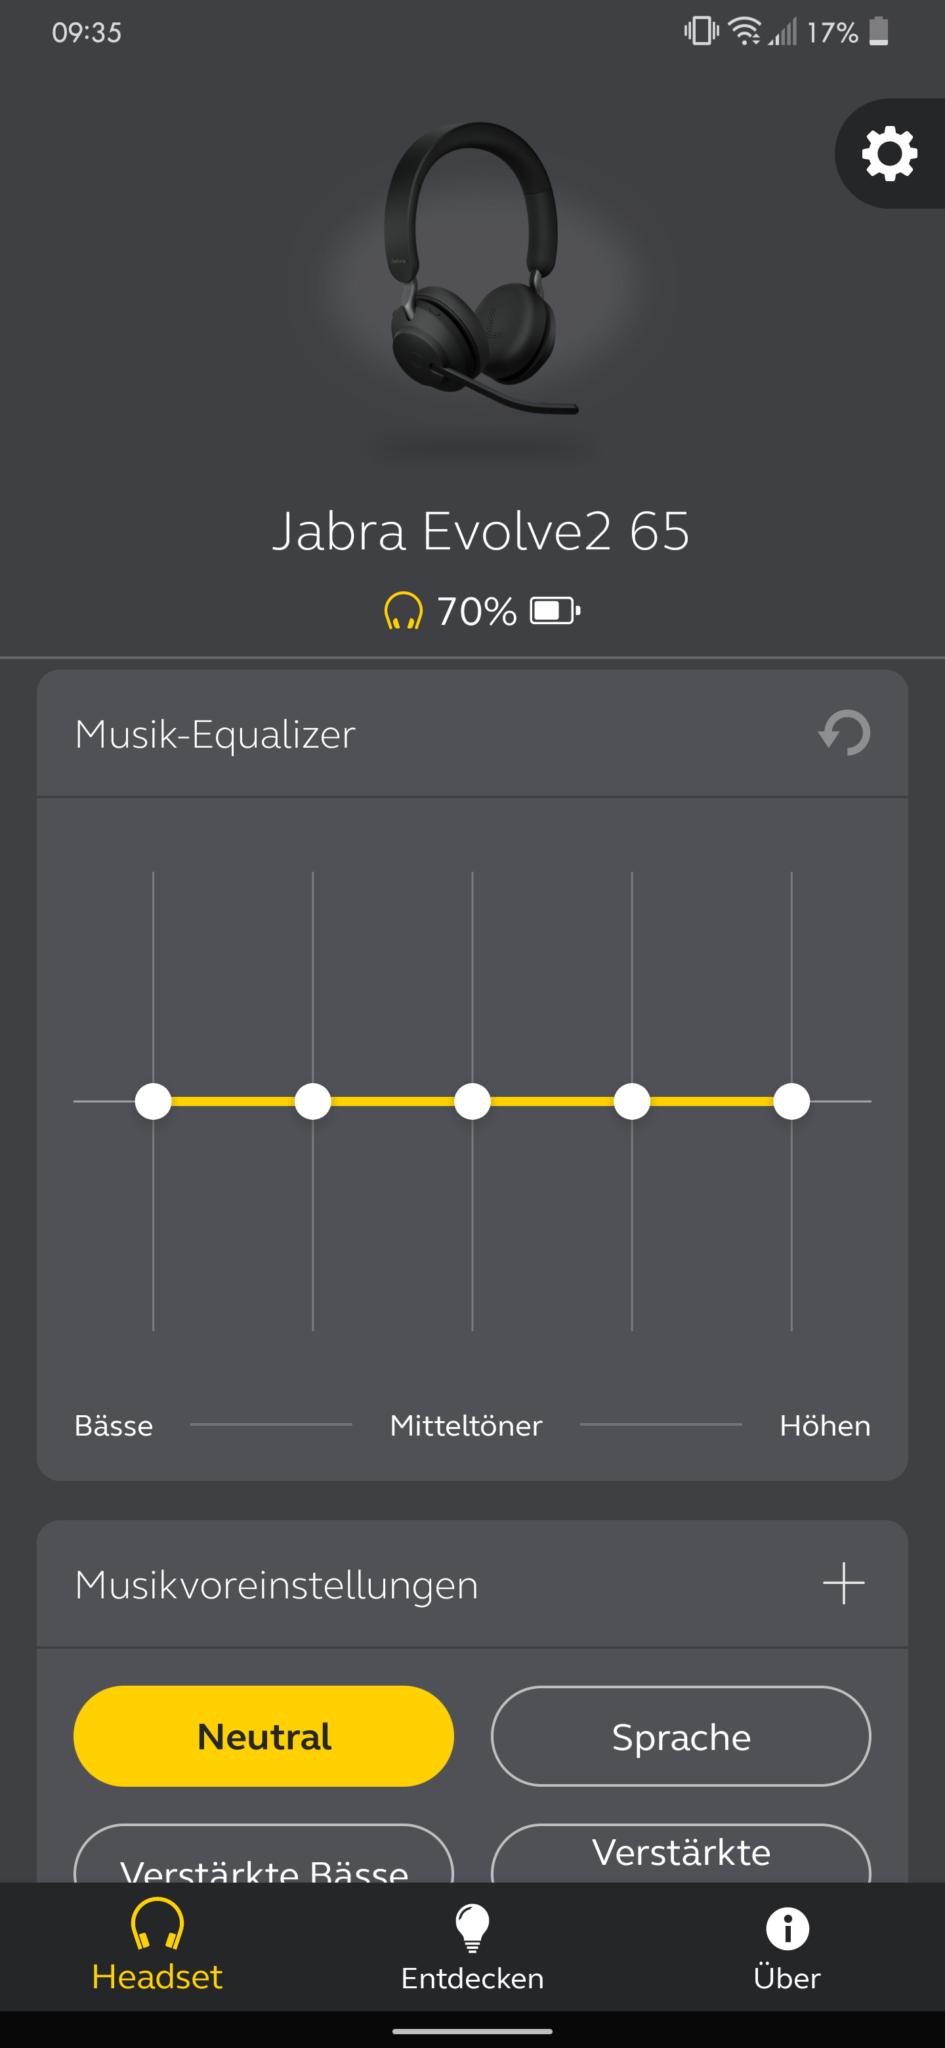 Jabra Sound+ Jabra Evolve2 65 Test Review Headset 4